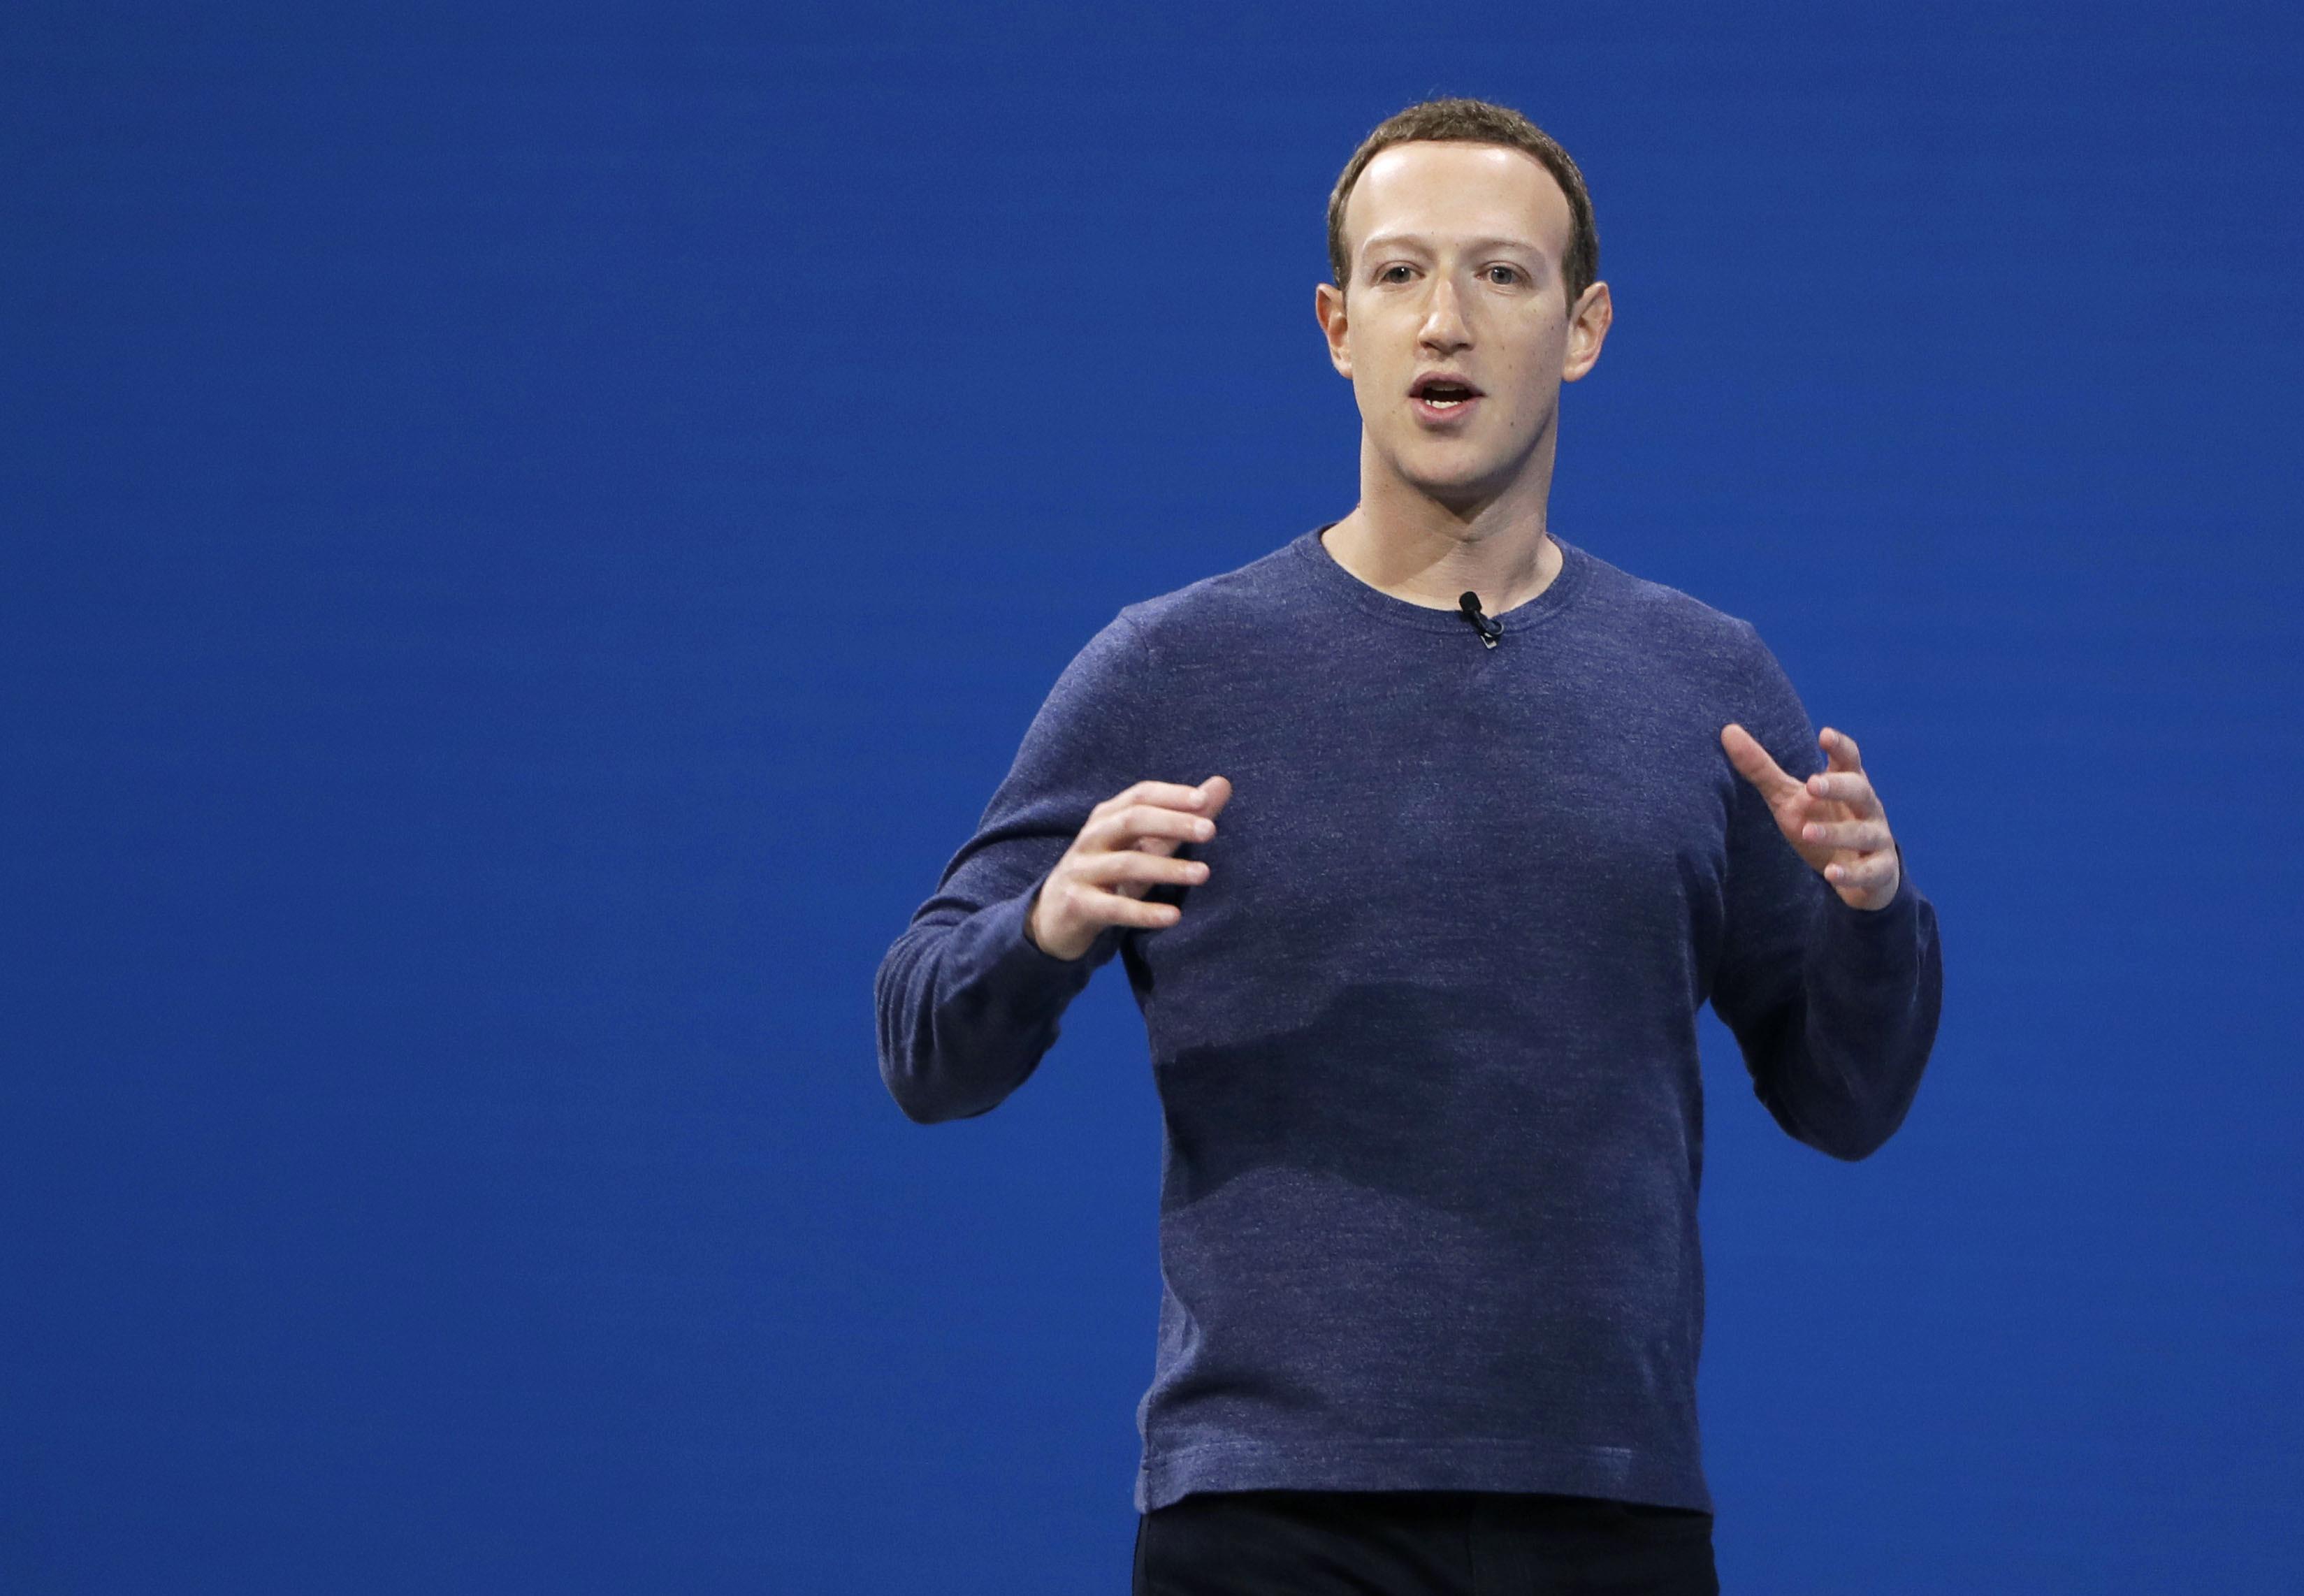 Zuckerberg says company 'evaluating' deepfake video policy